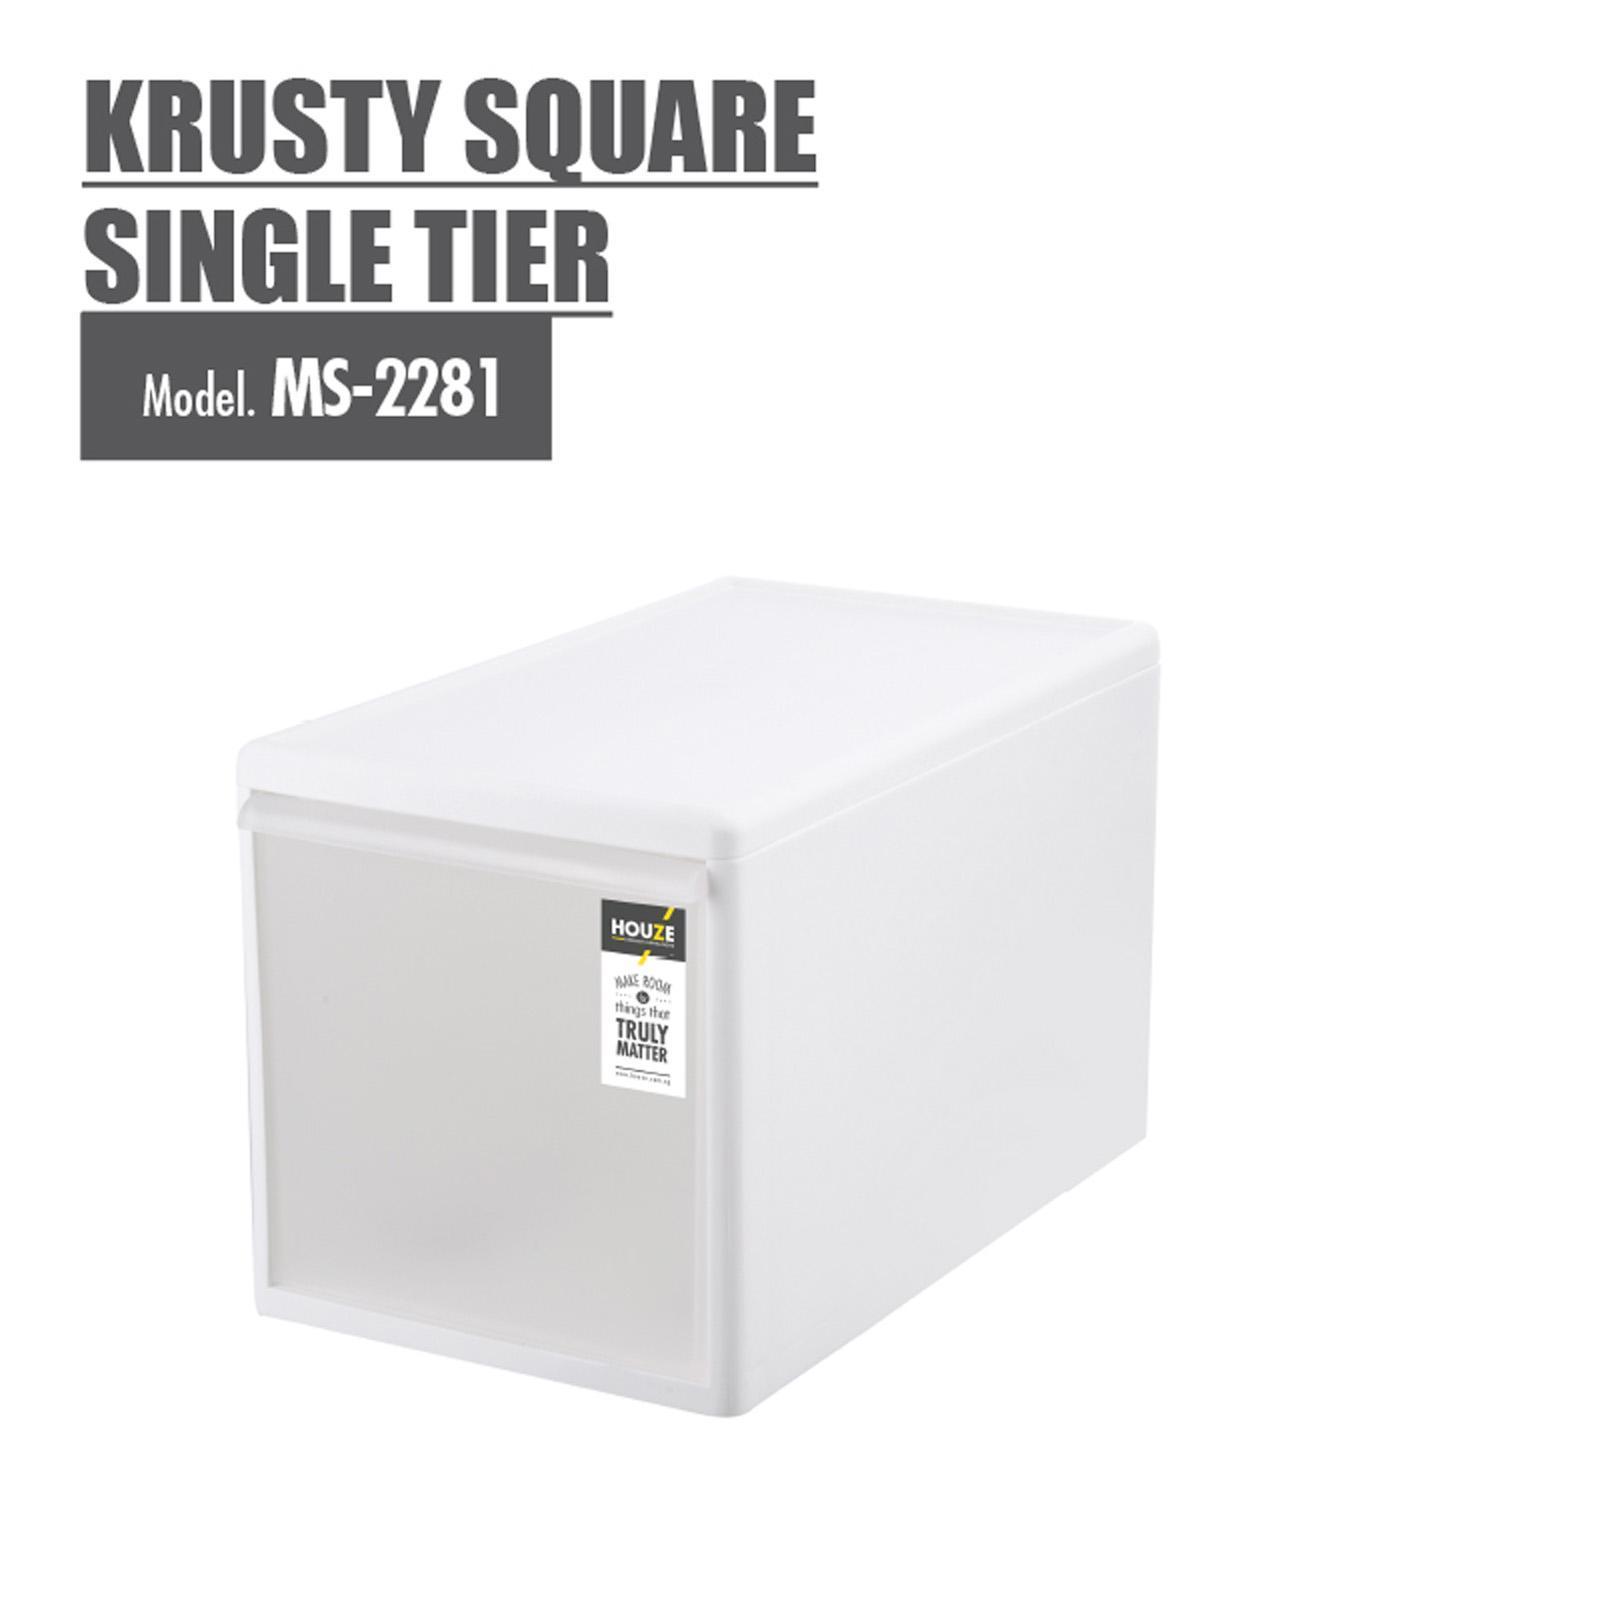 HOUZE Krusty Square Single Tier Drawer